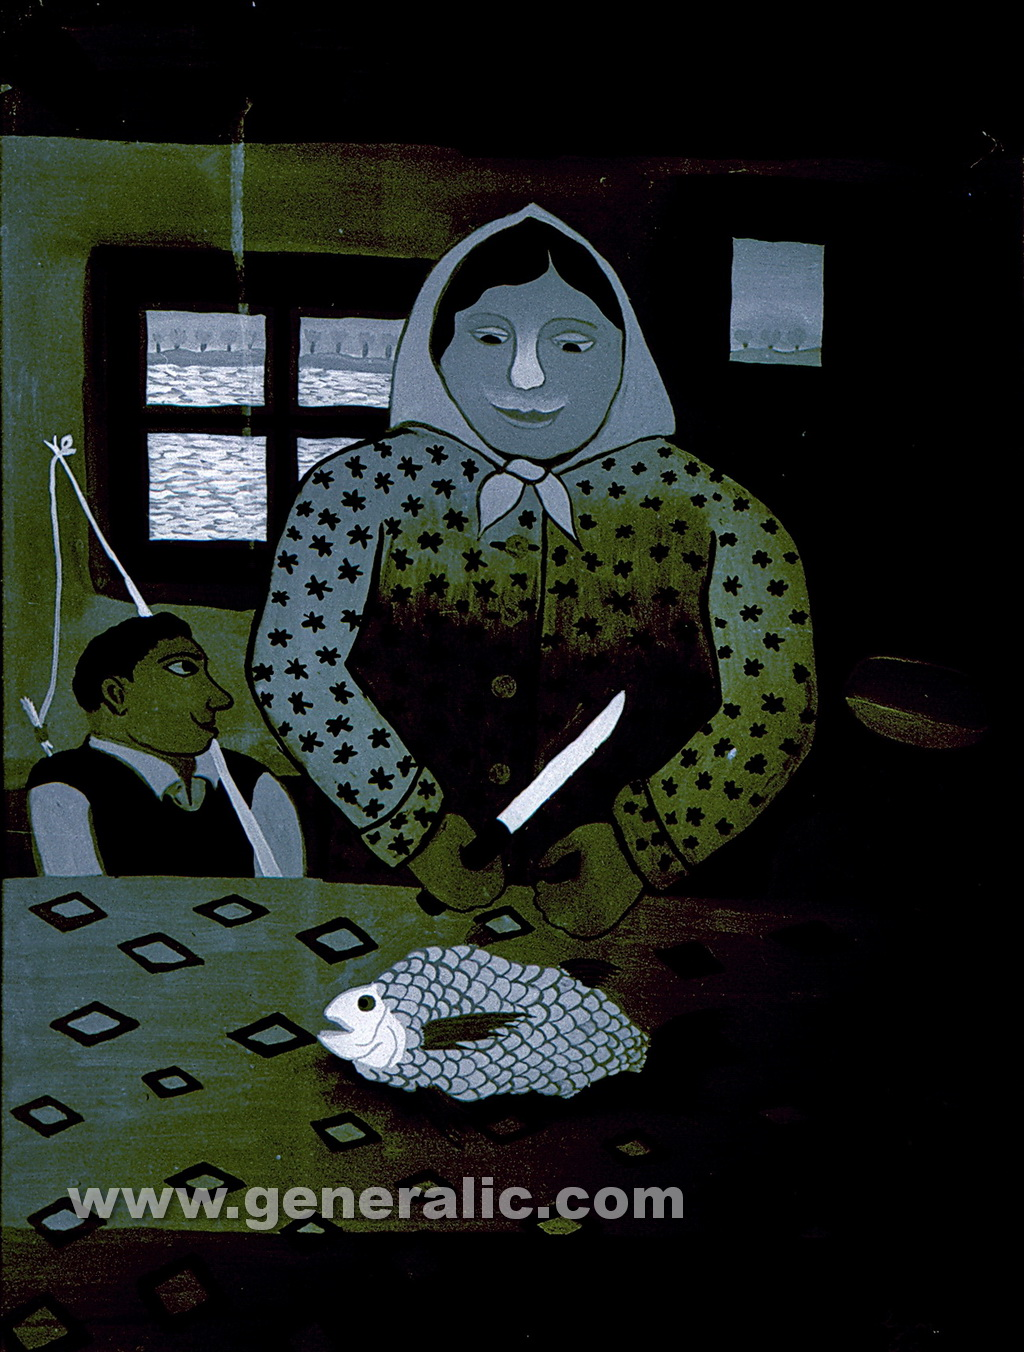 Josip Generalic, 1960, Preparing the fish, oil on glass